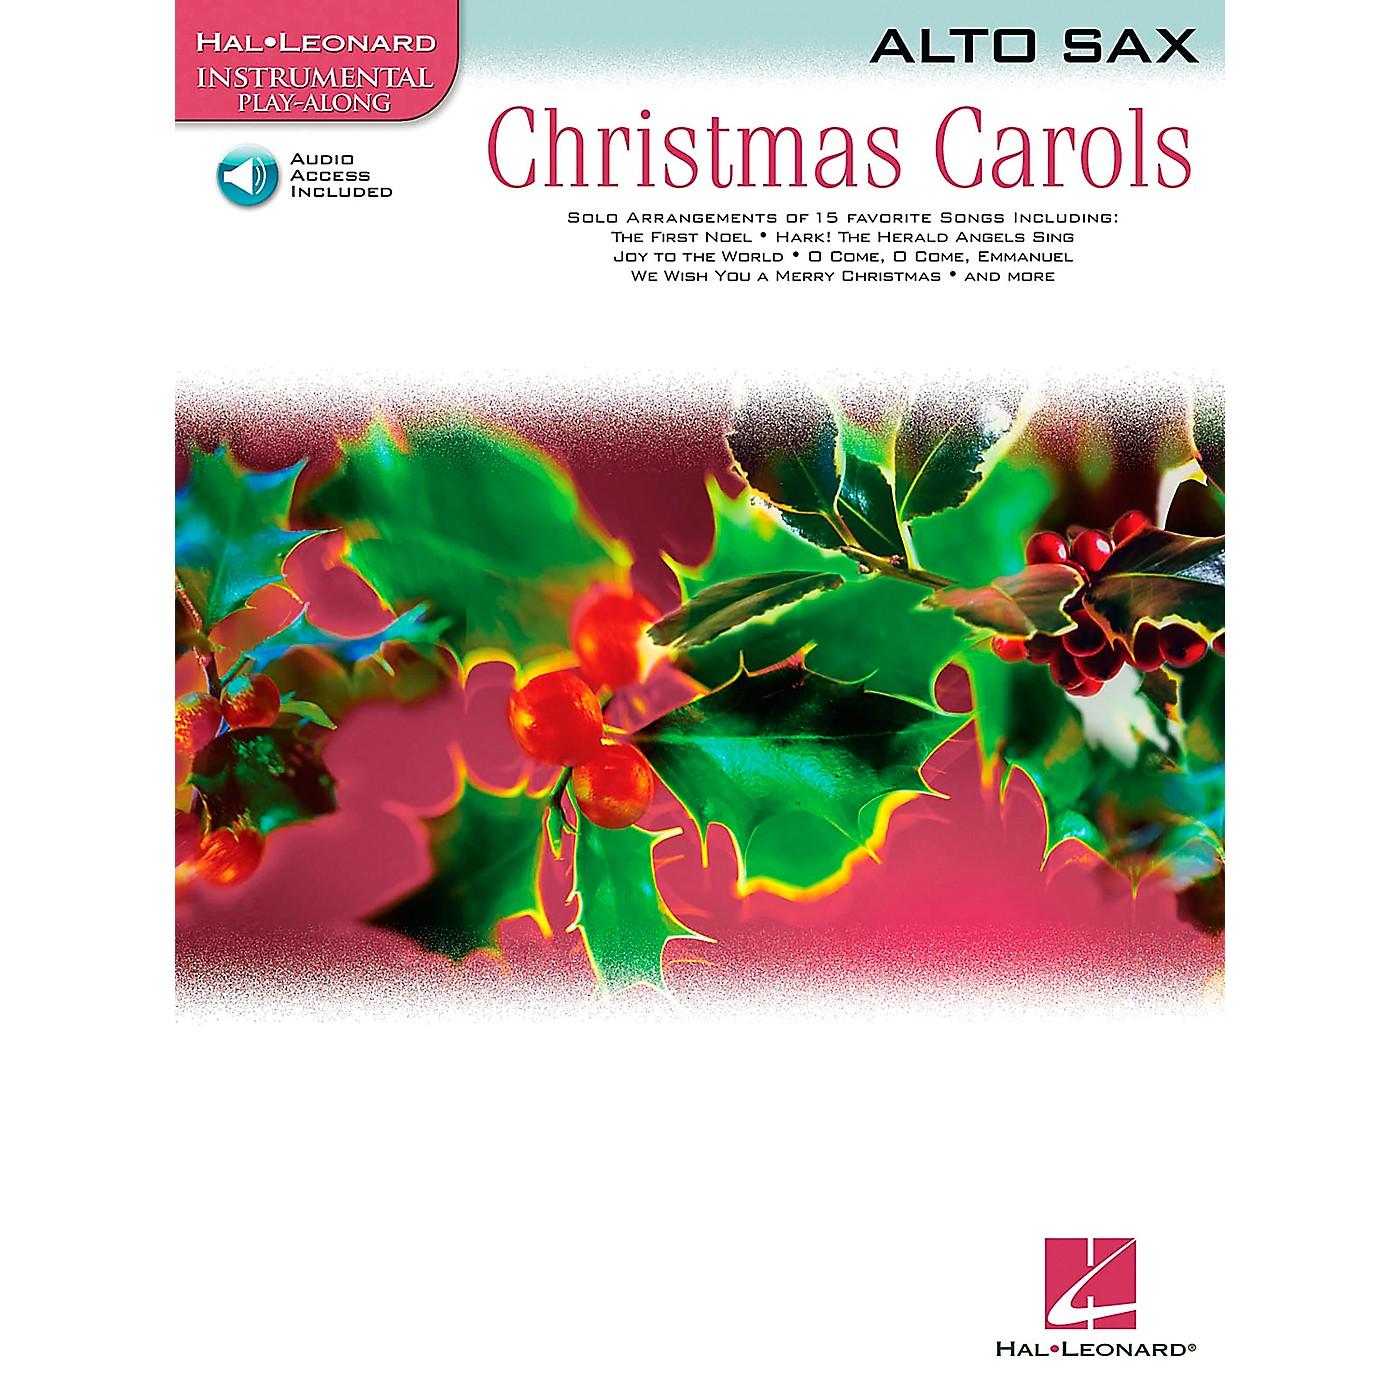 Hal Leonard Christmas Carols for Alto Sax Book/CD thumbnail